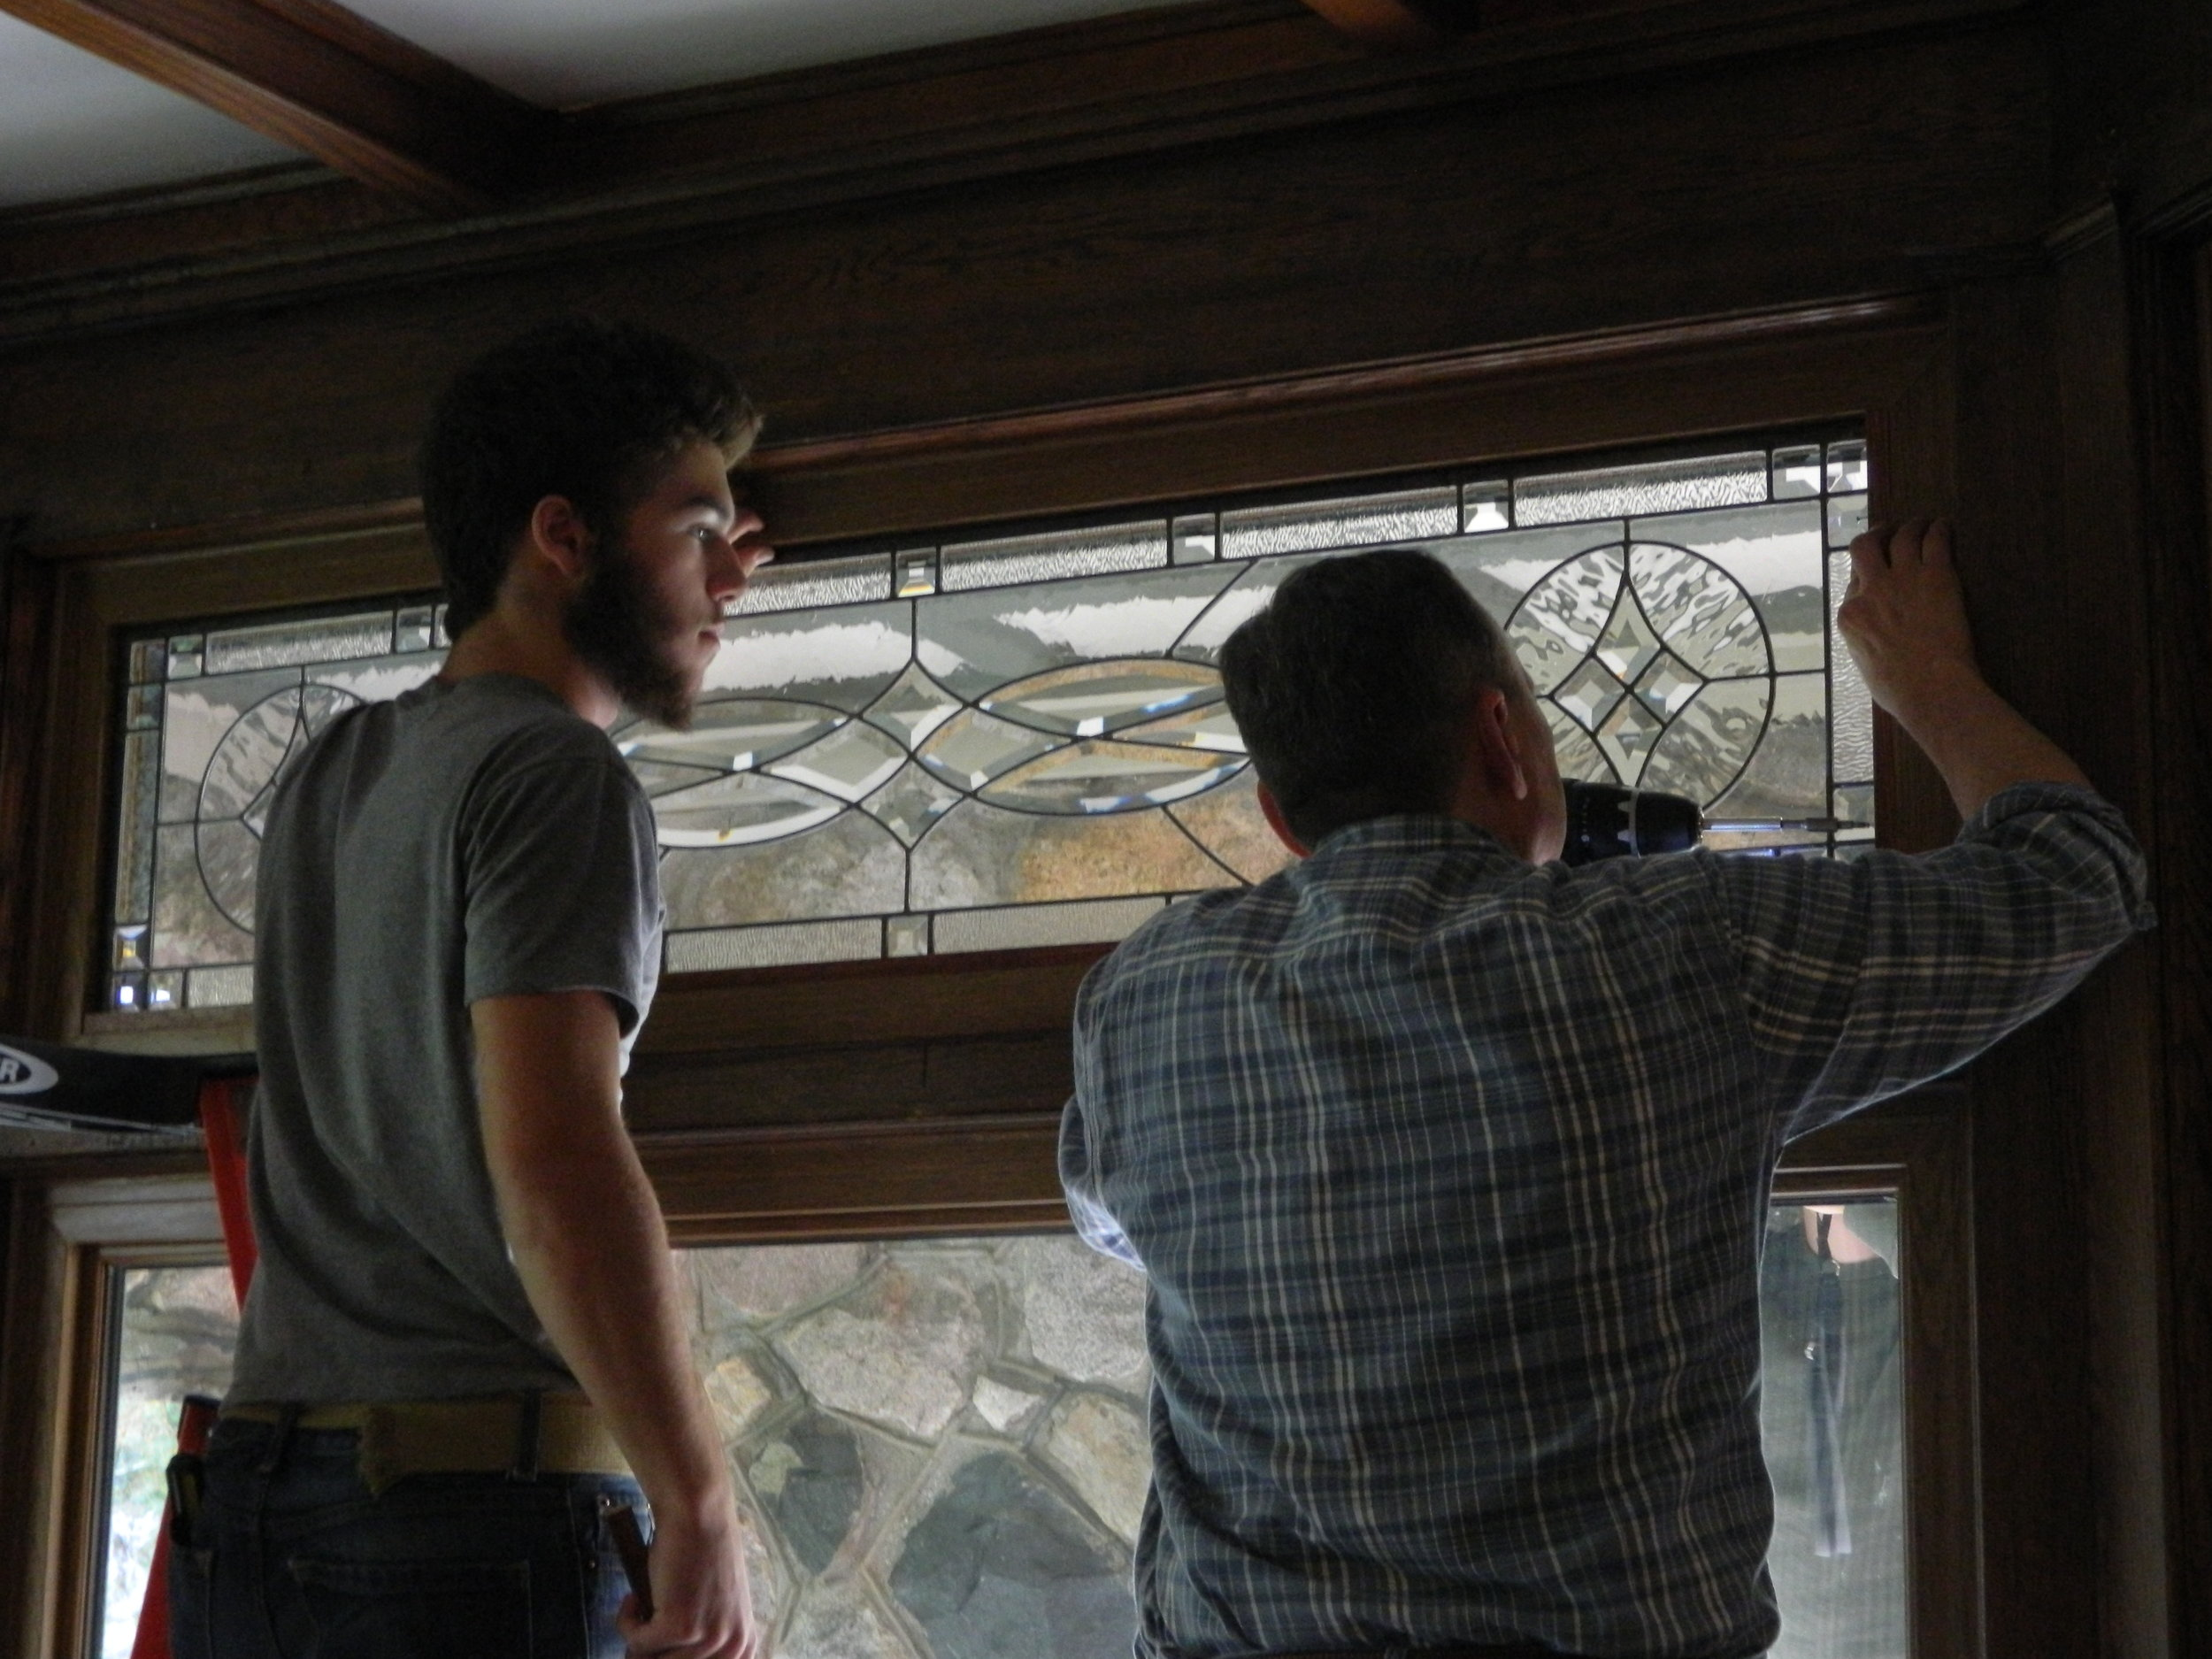 installing new stainglass windows